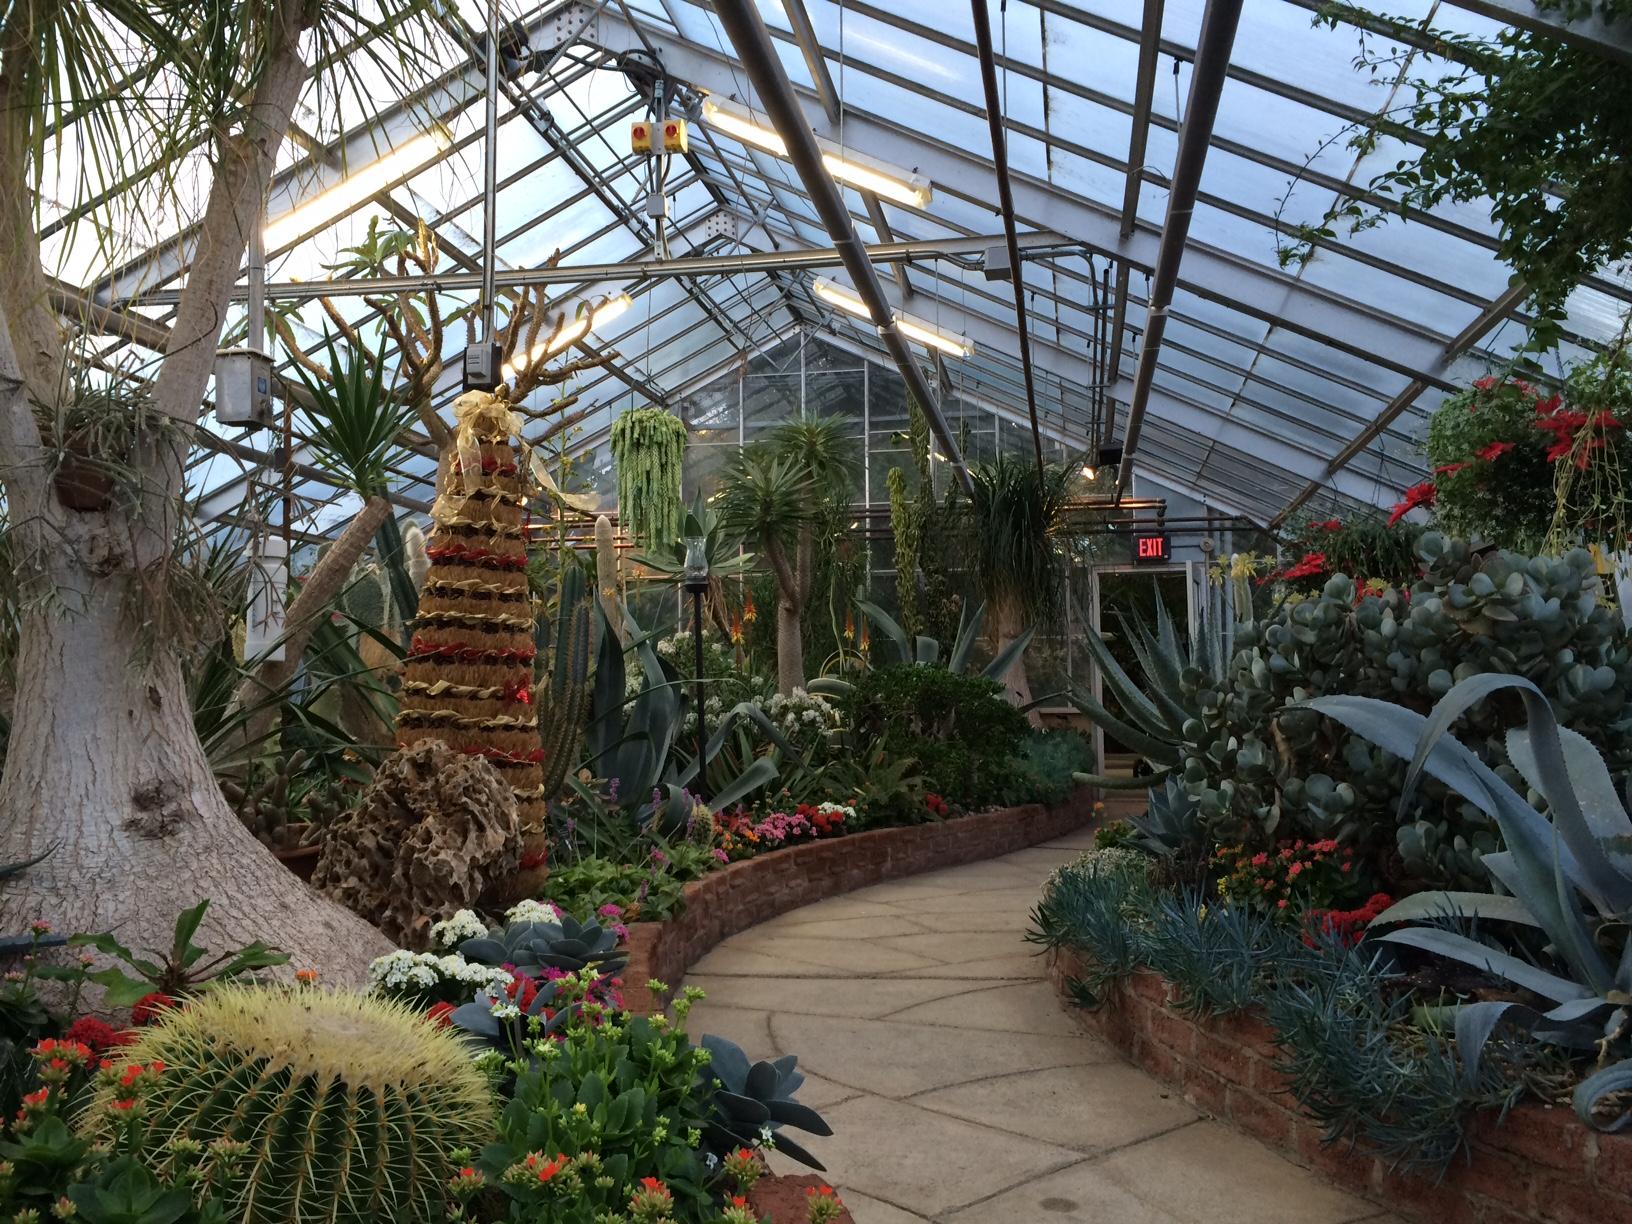 centennial park conservatory – kids in t o